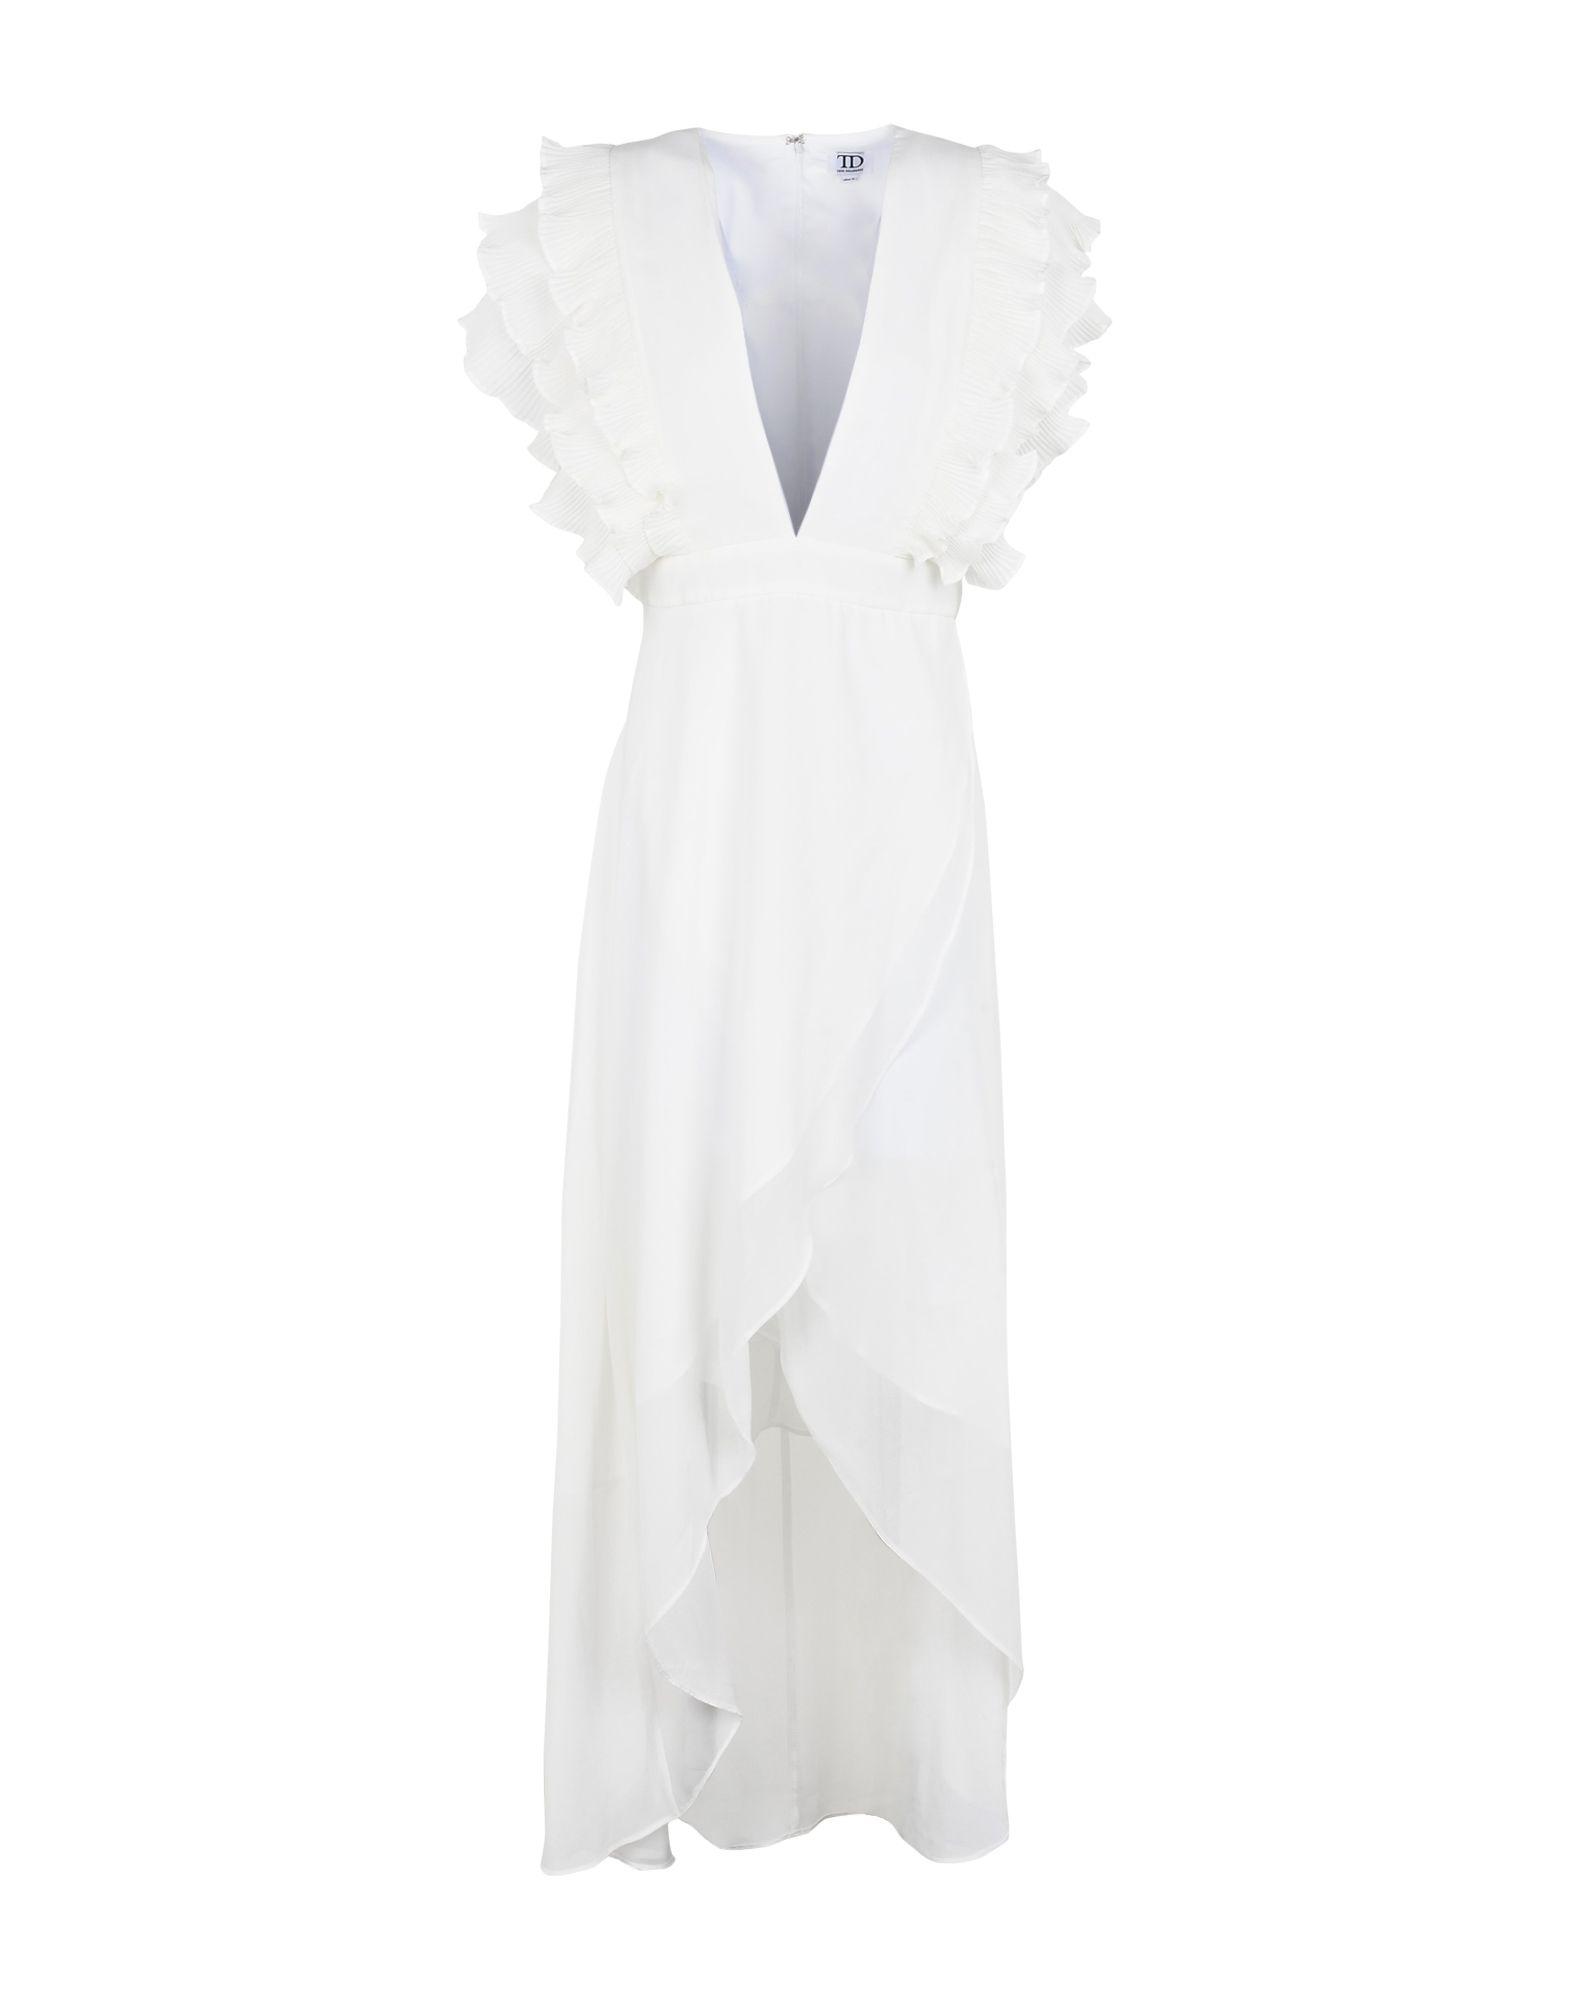 TD TRUE DECADENCE Длинное платье original lb050wq02 td03 display td 03 lb050wq2